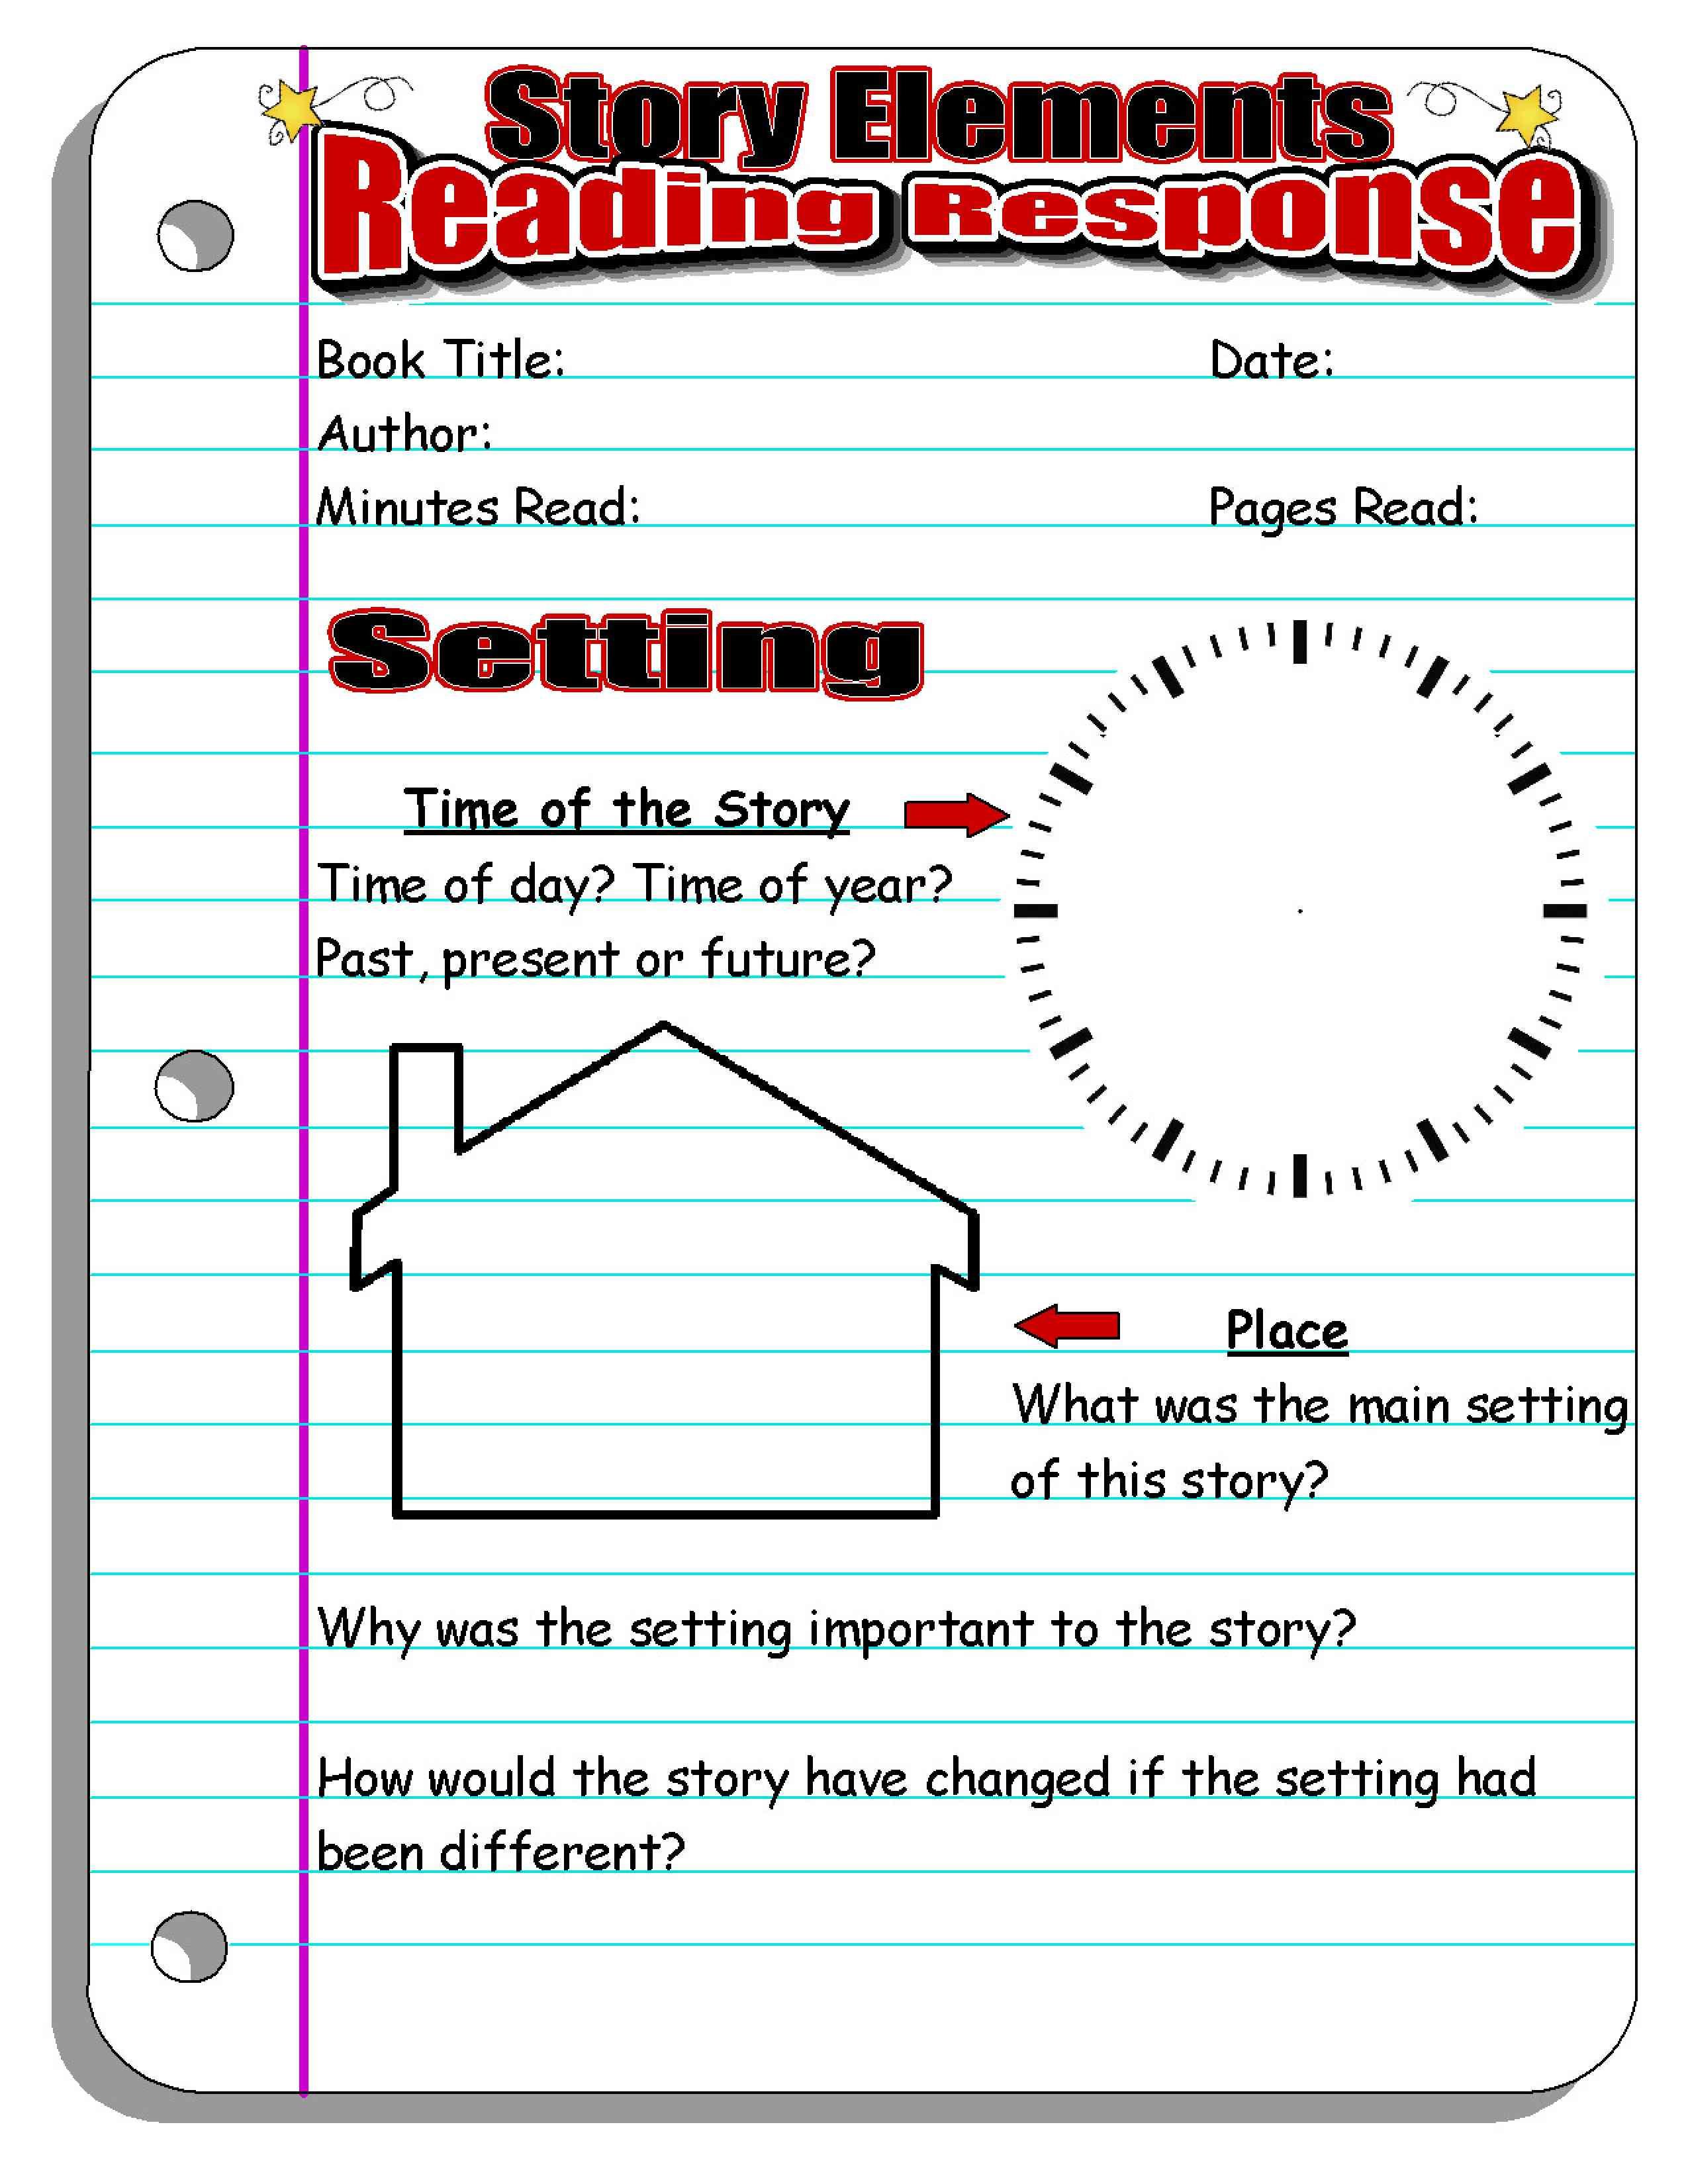 Story Elements Worksheet 2nd Grade Story Elements Worksheets 3rd Grade